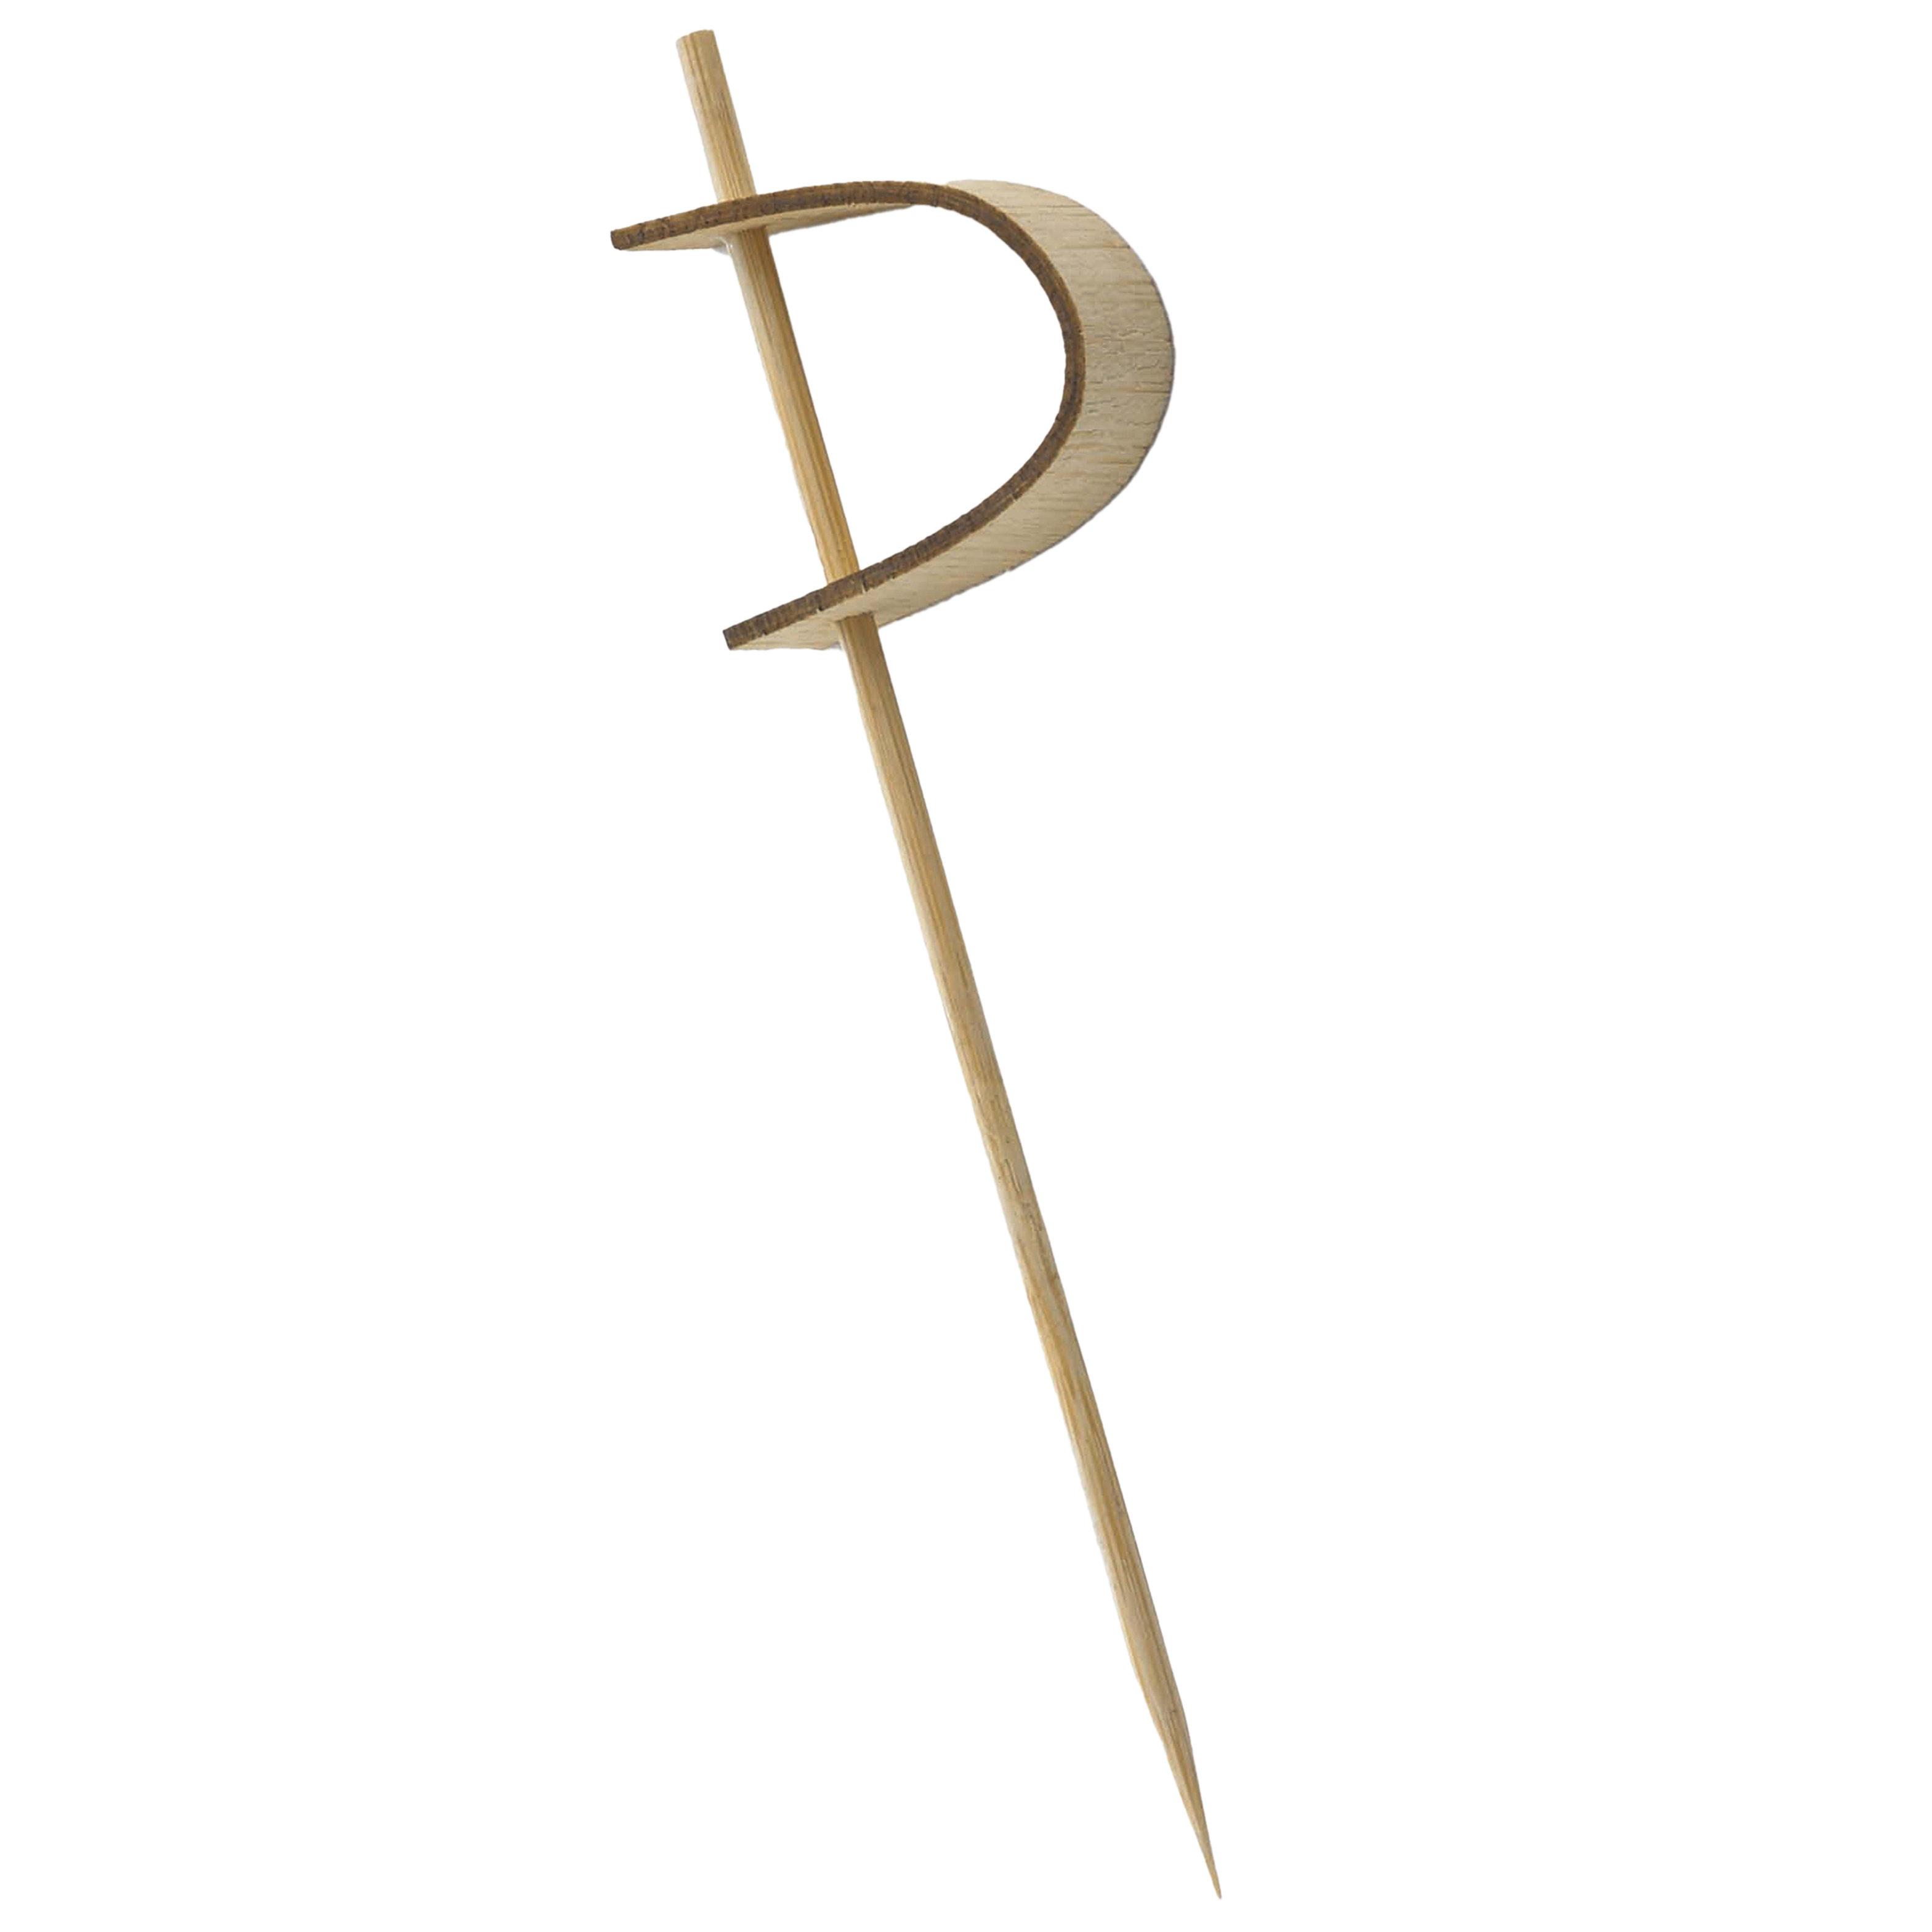 "Tablecraft BAMPS45 4.5"" Bamboo Sword Pick"